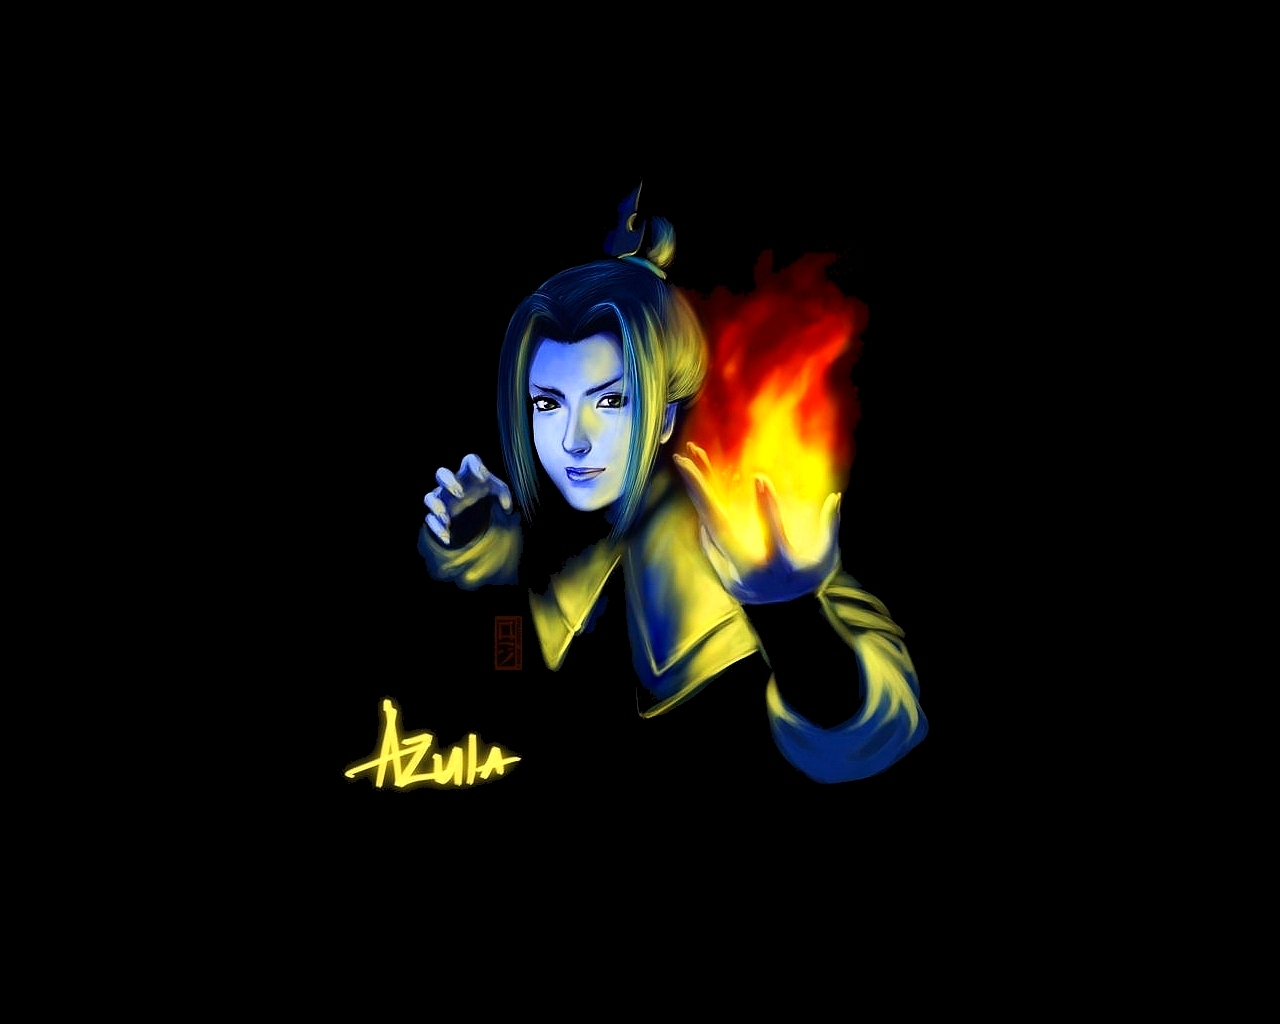 12 Avatar The Last Airbender Wallpaper 1280x1024